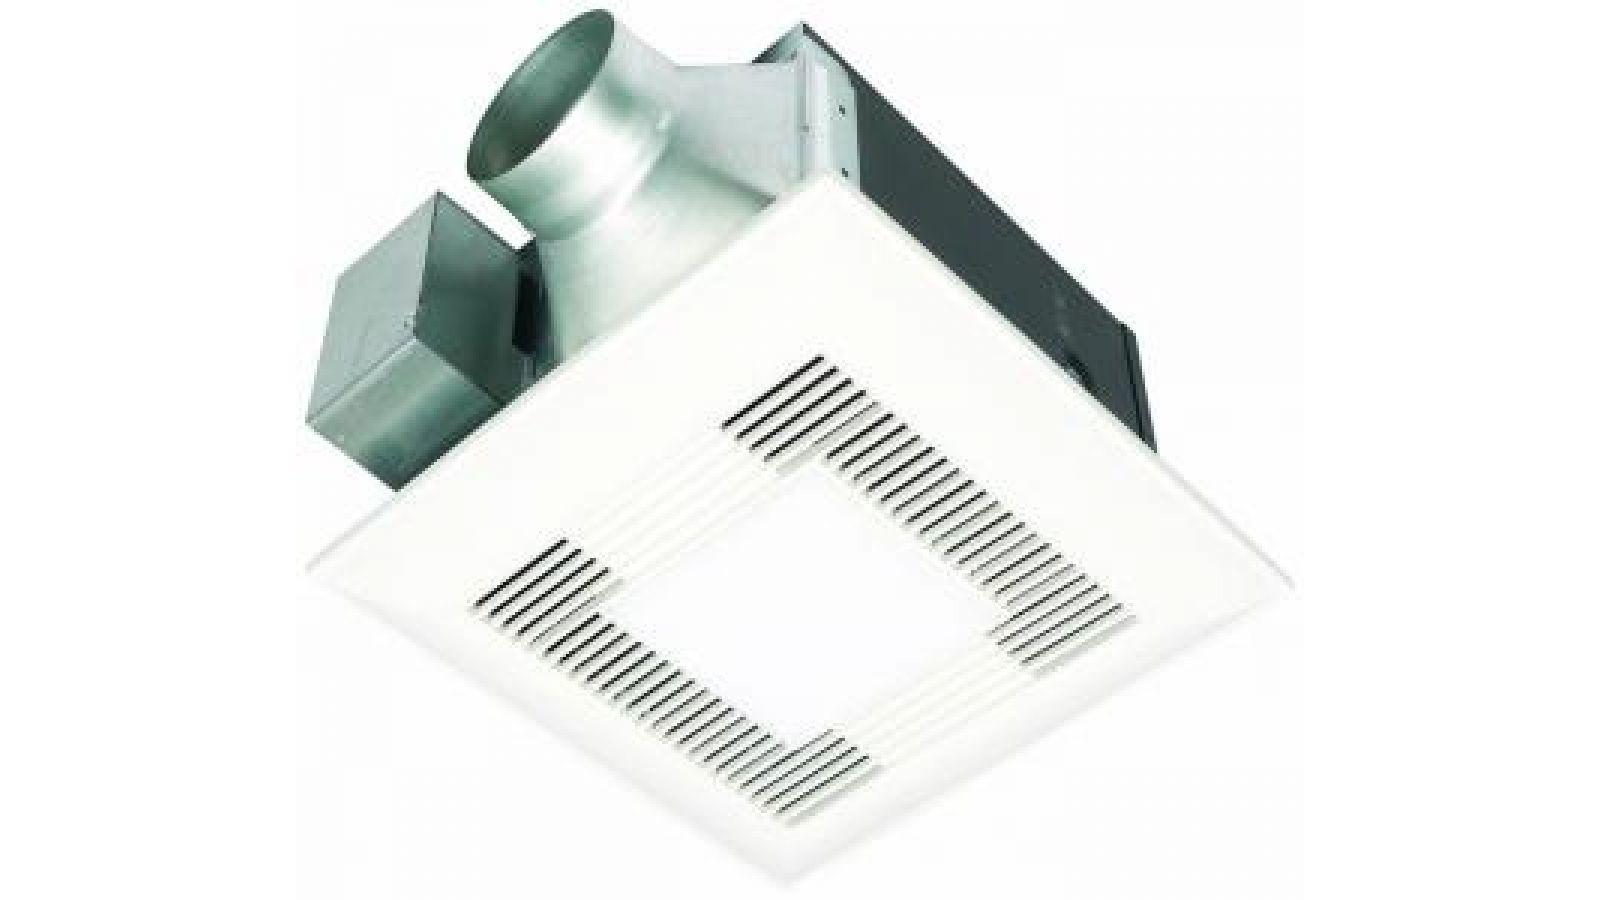 WhisperLite' FV-08VQL5 Ventilation Fan